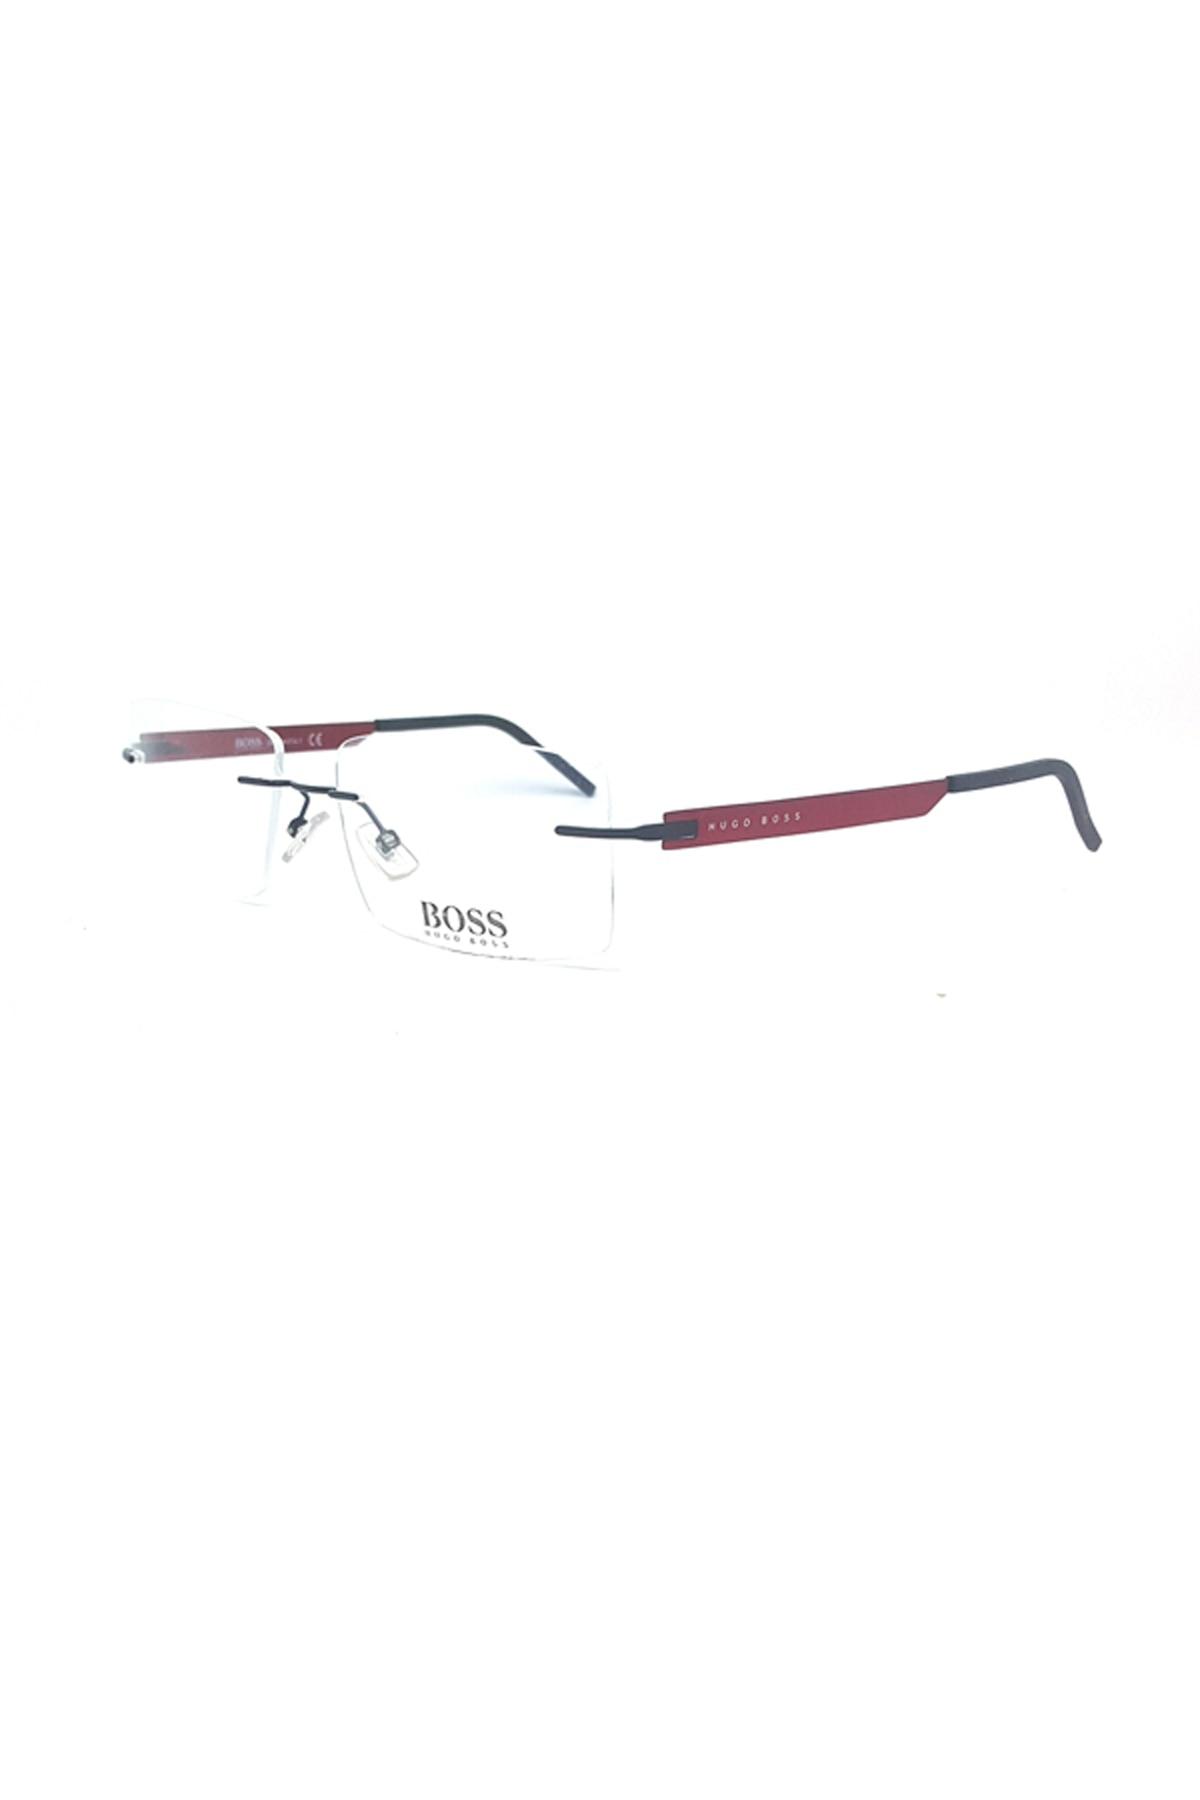 Gafas de lectura Markamilla para hombre, montura de gafas de demostración, gafas transparentes de alta calidad MenHugo Boss HB 0225 27Z 55 17